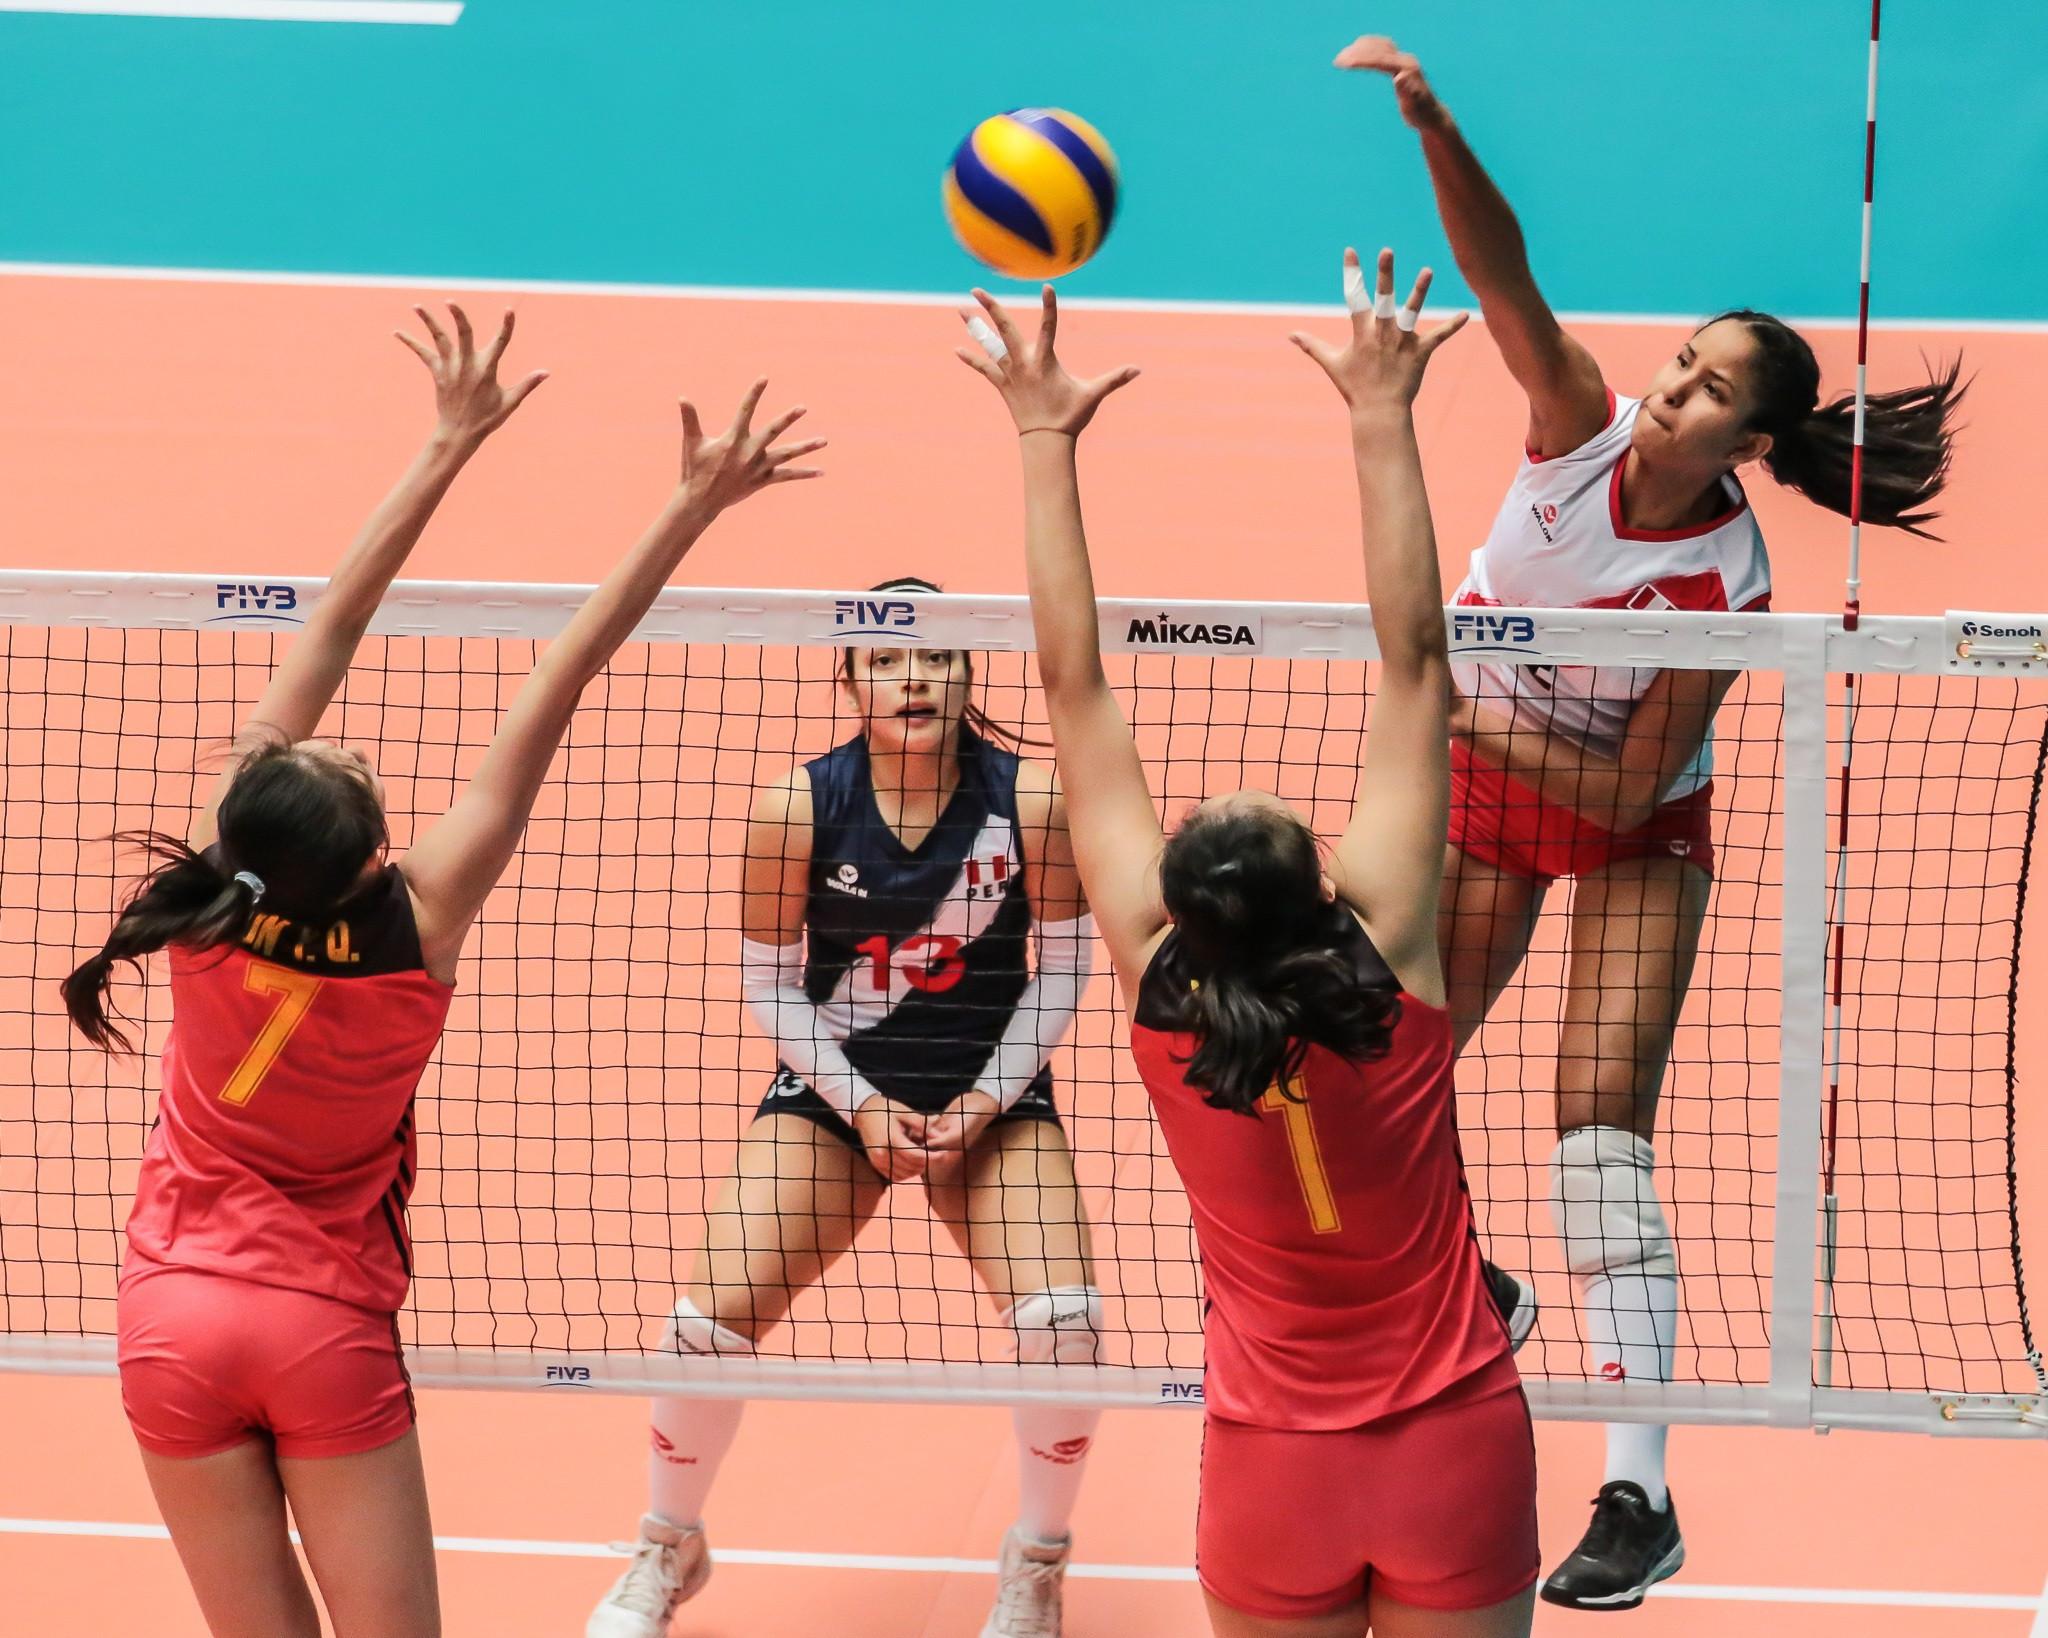 Peru beat holders China on day one of FIVB Women's Under-20 World Championship